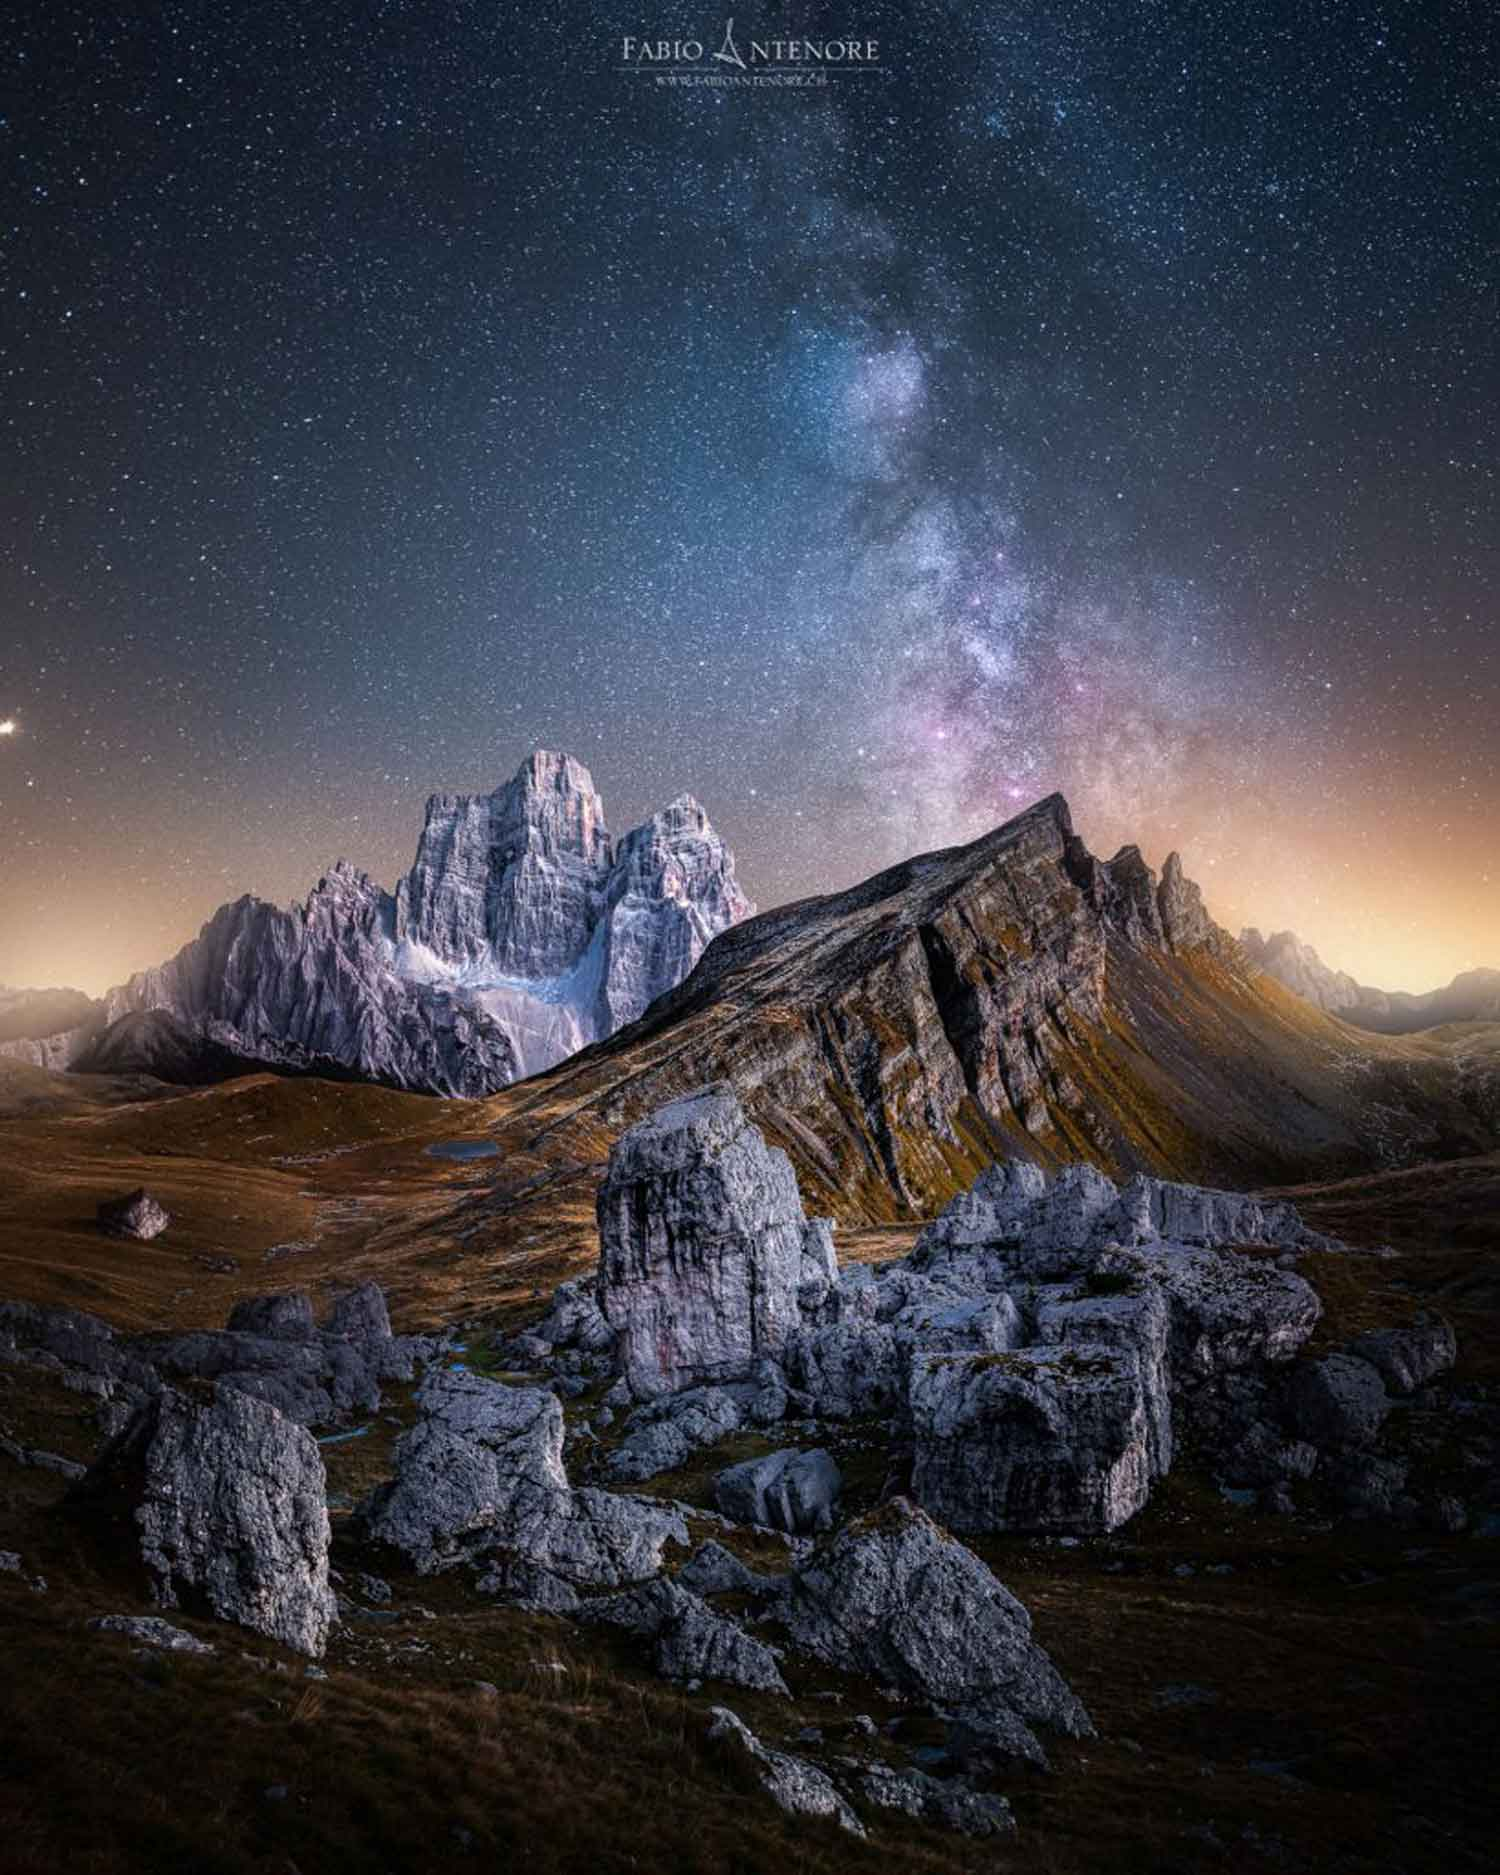 fabio-antenore-nacht-fotografie